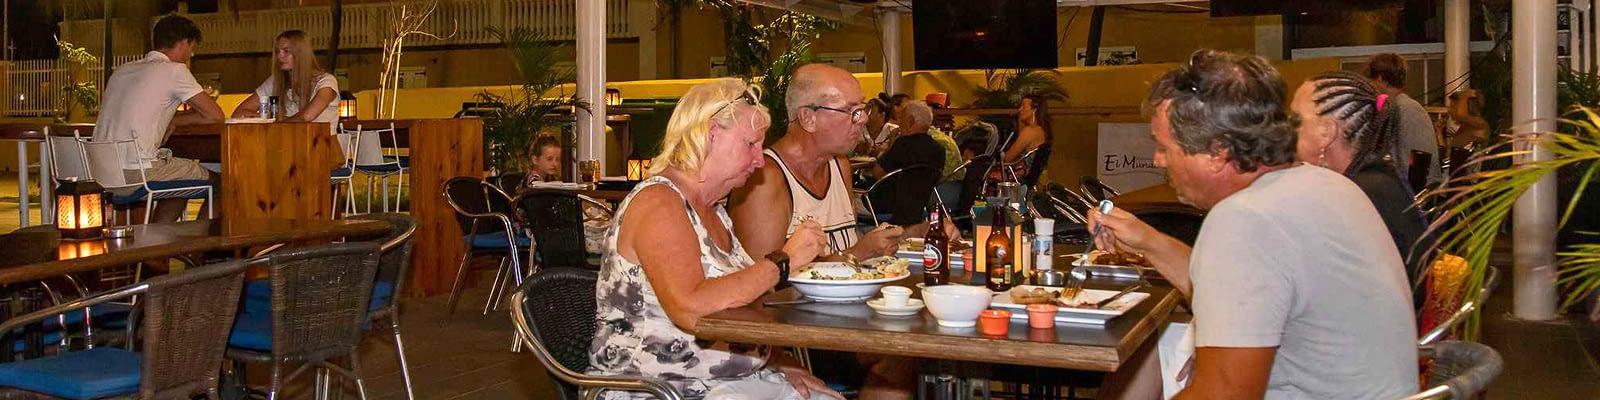 el-mundo-restaurant-bonaire-slider-8